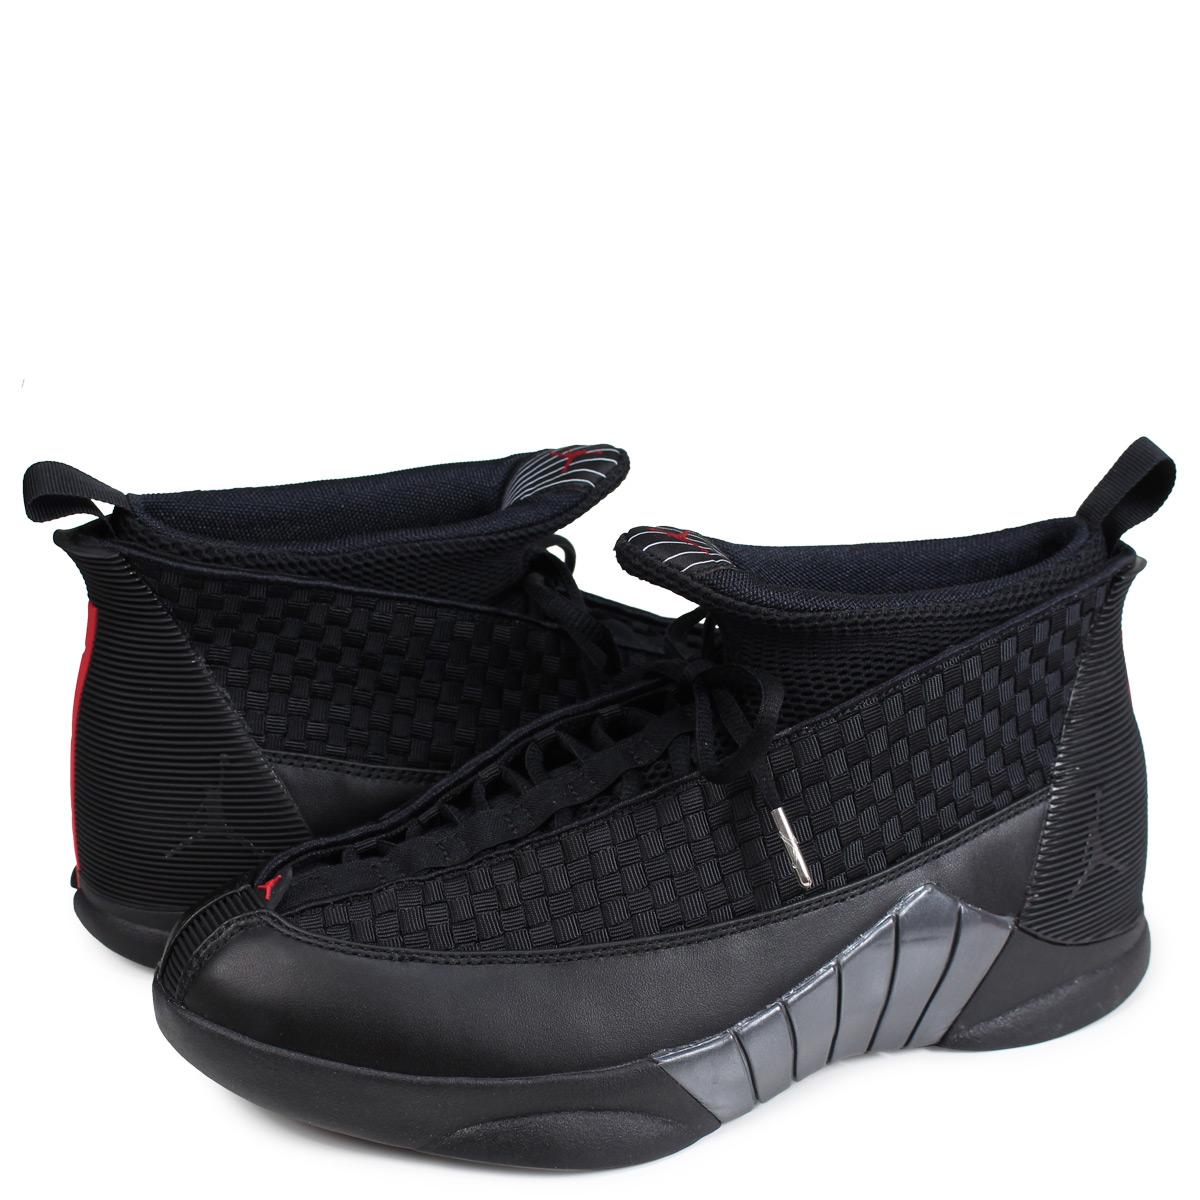 79b0095e78b Nike NIKE Jordan 15 nostalgic sneakers men AIR JORDAN 15 RETRO black  881,429-001 ...